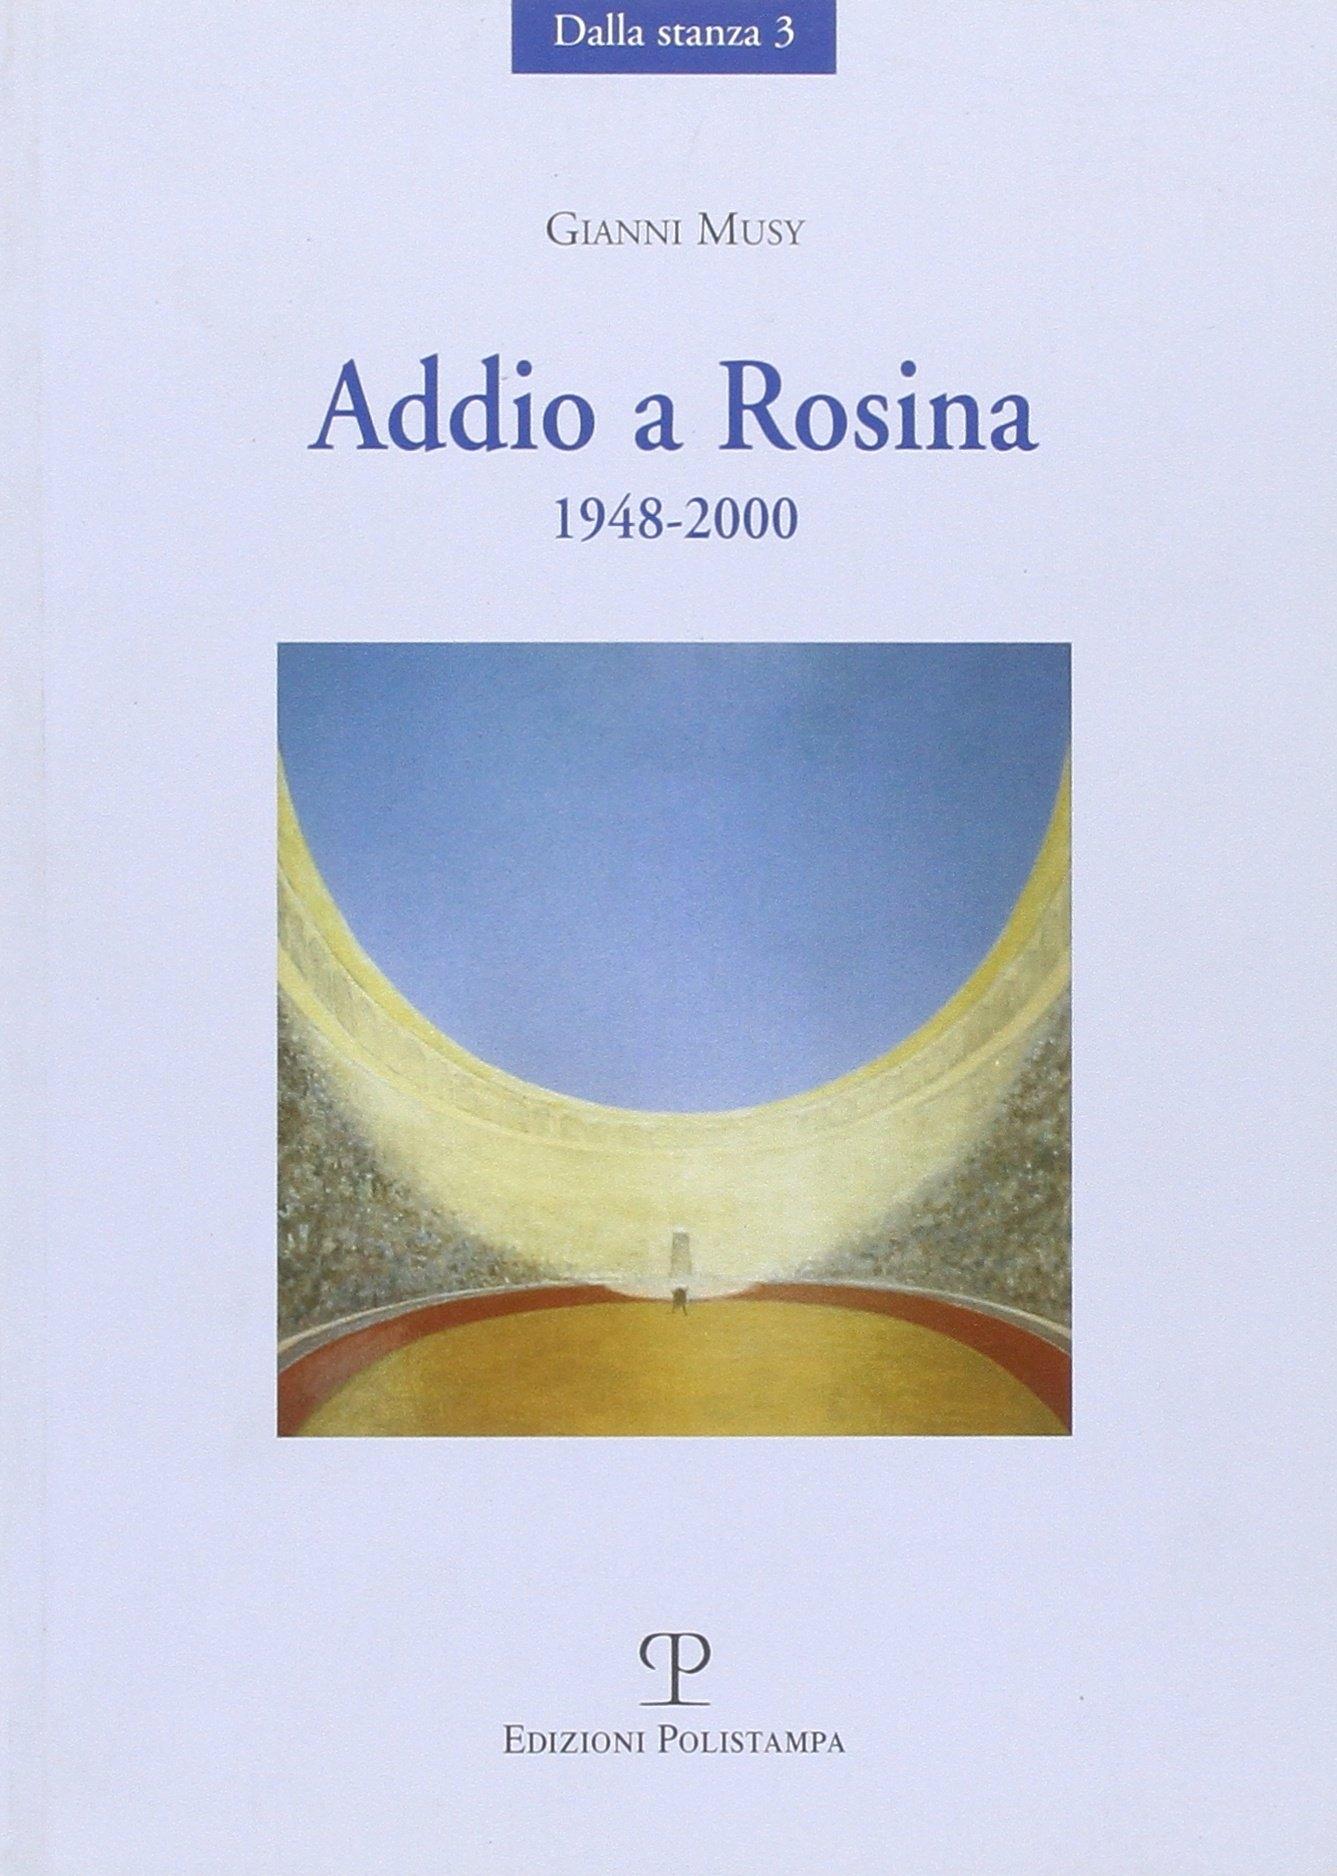 Addio a Rosina. 1948-2000